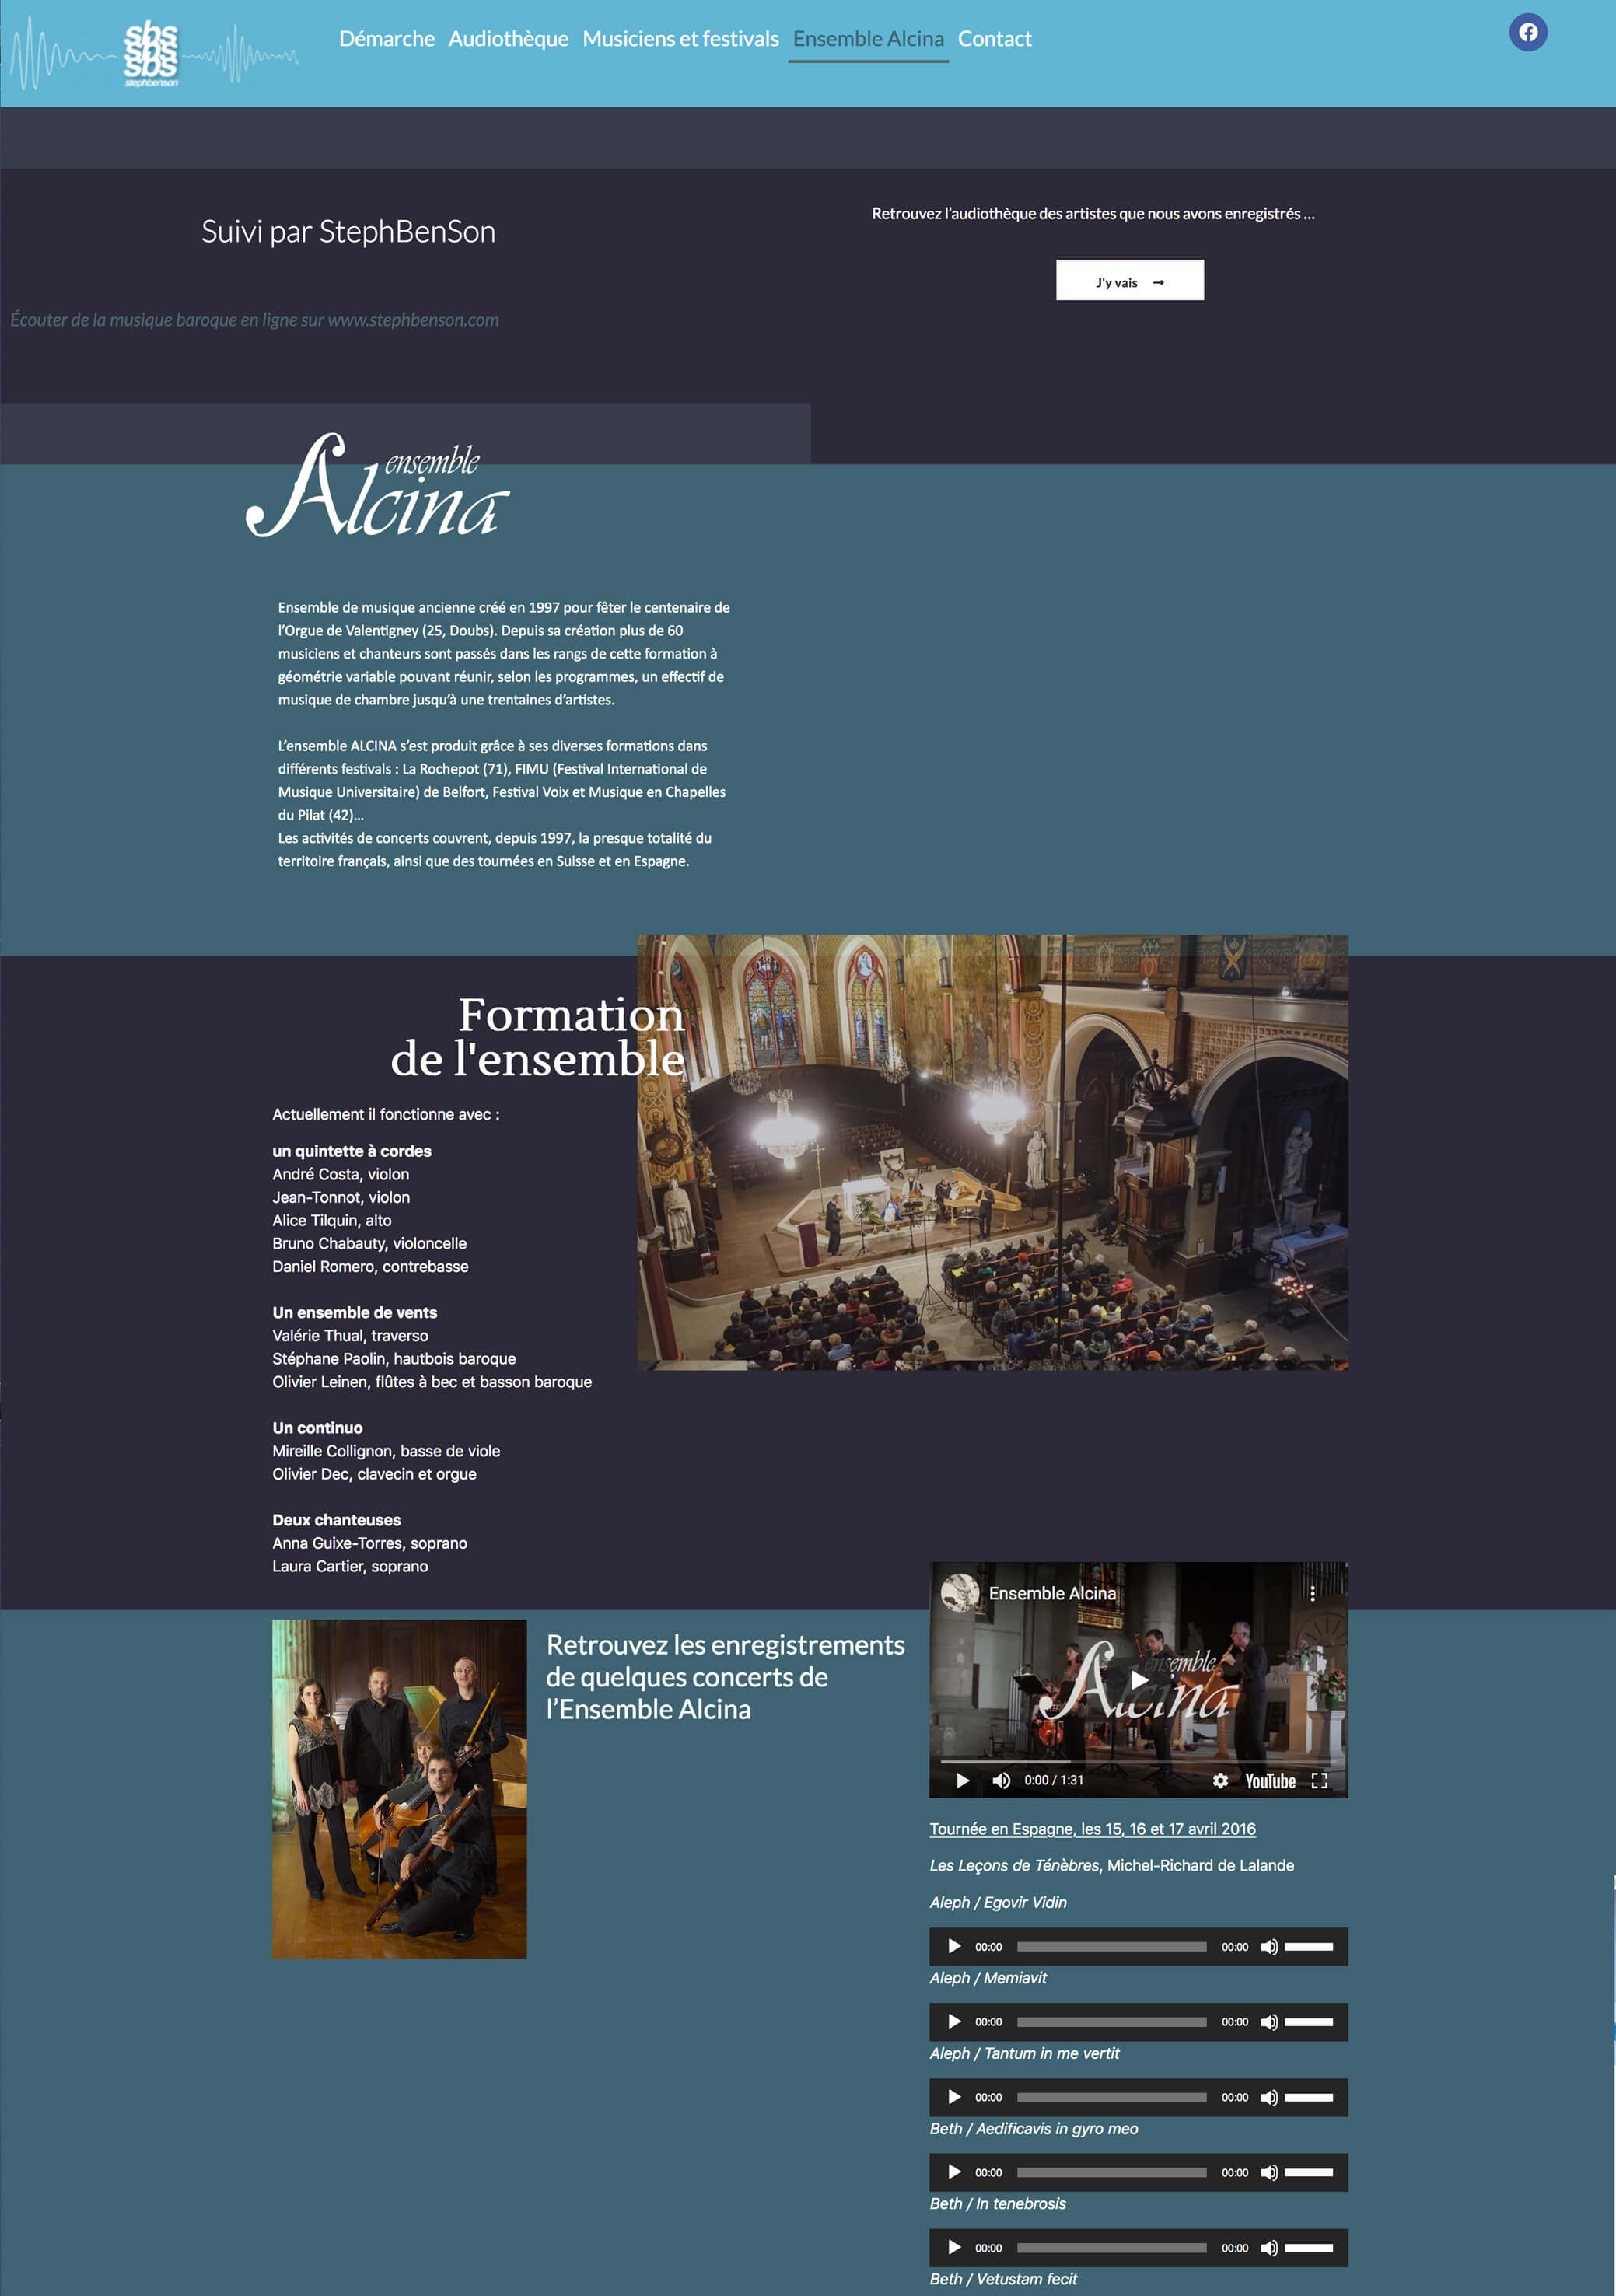 Stephbenson Site Web Sextant Creative